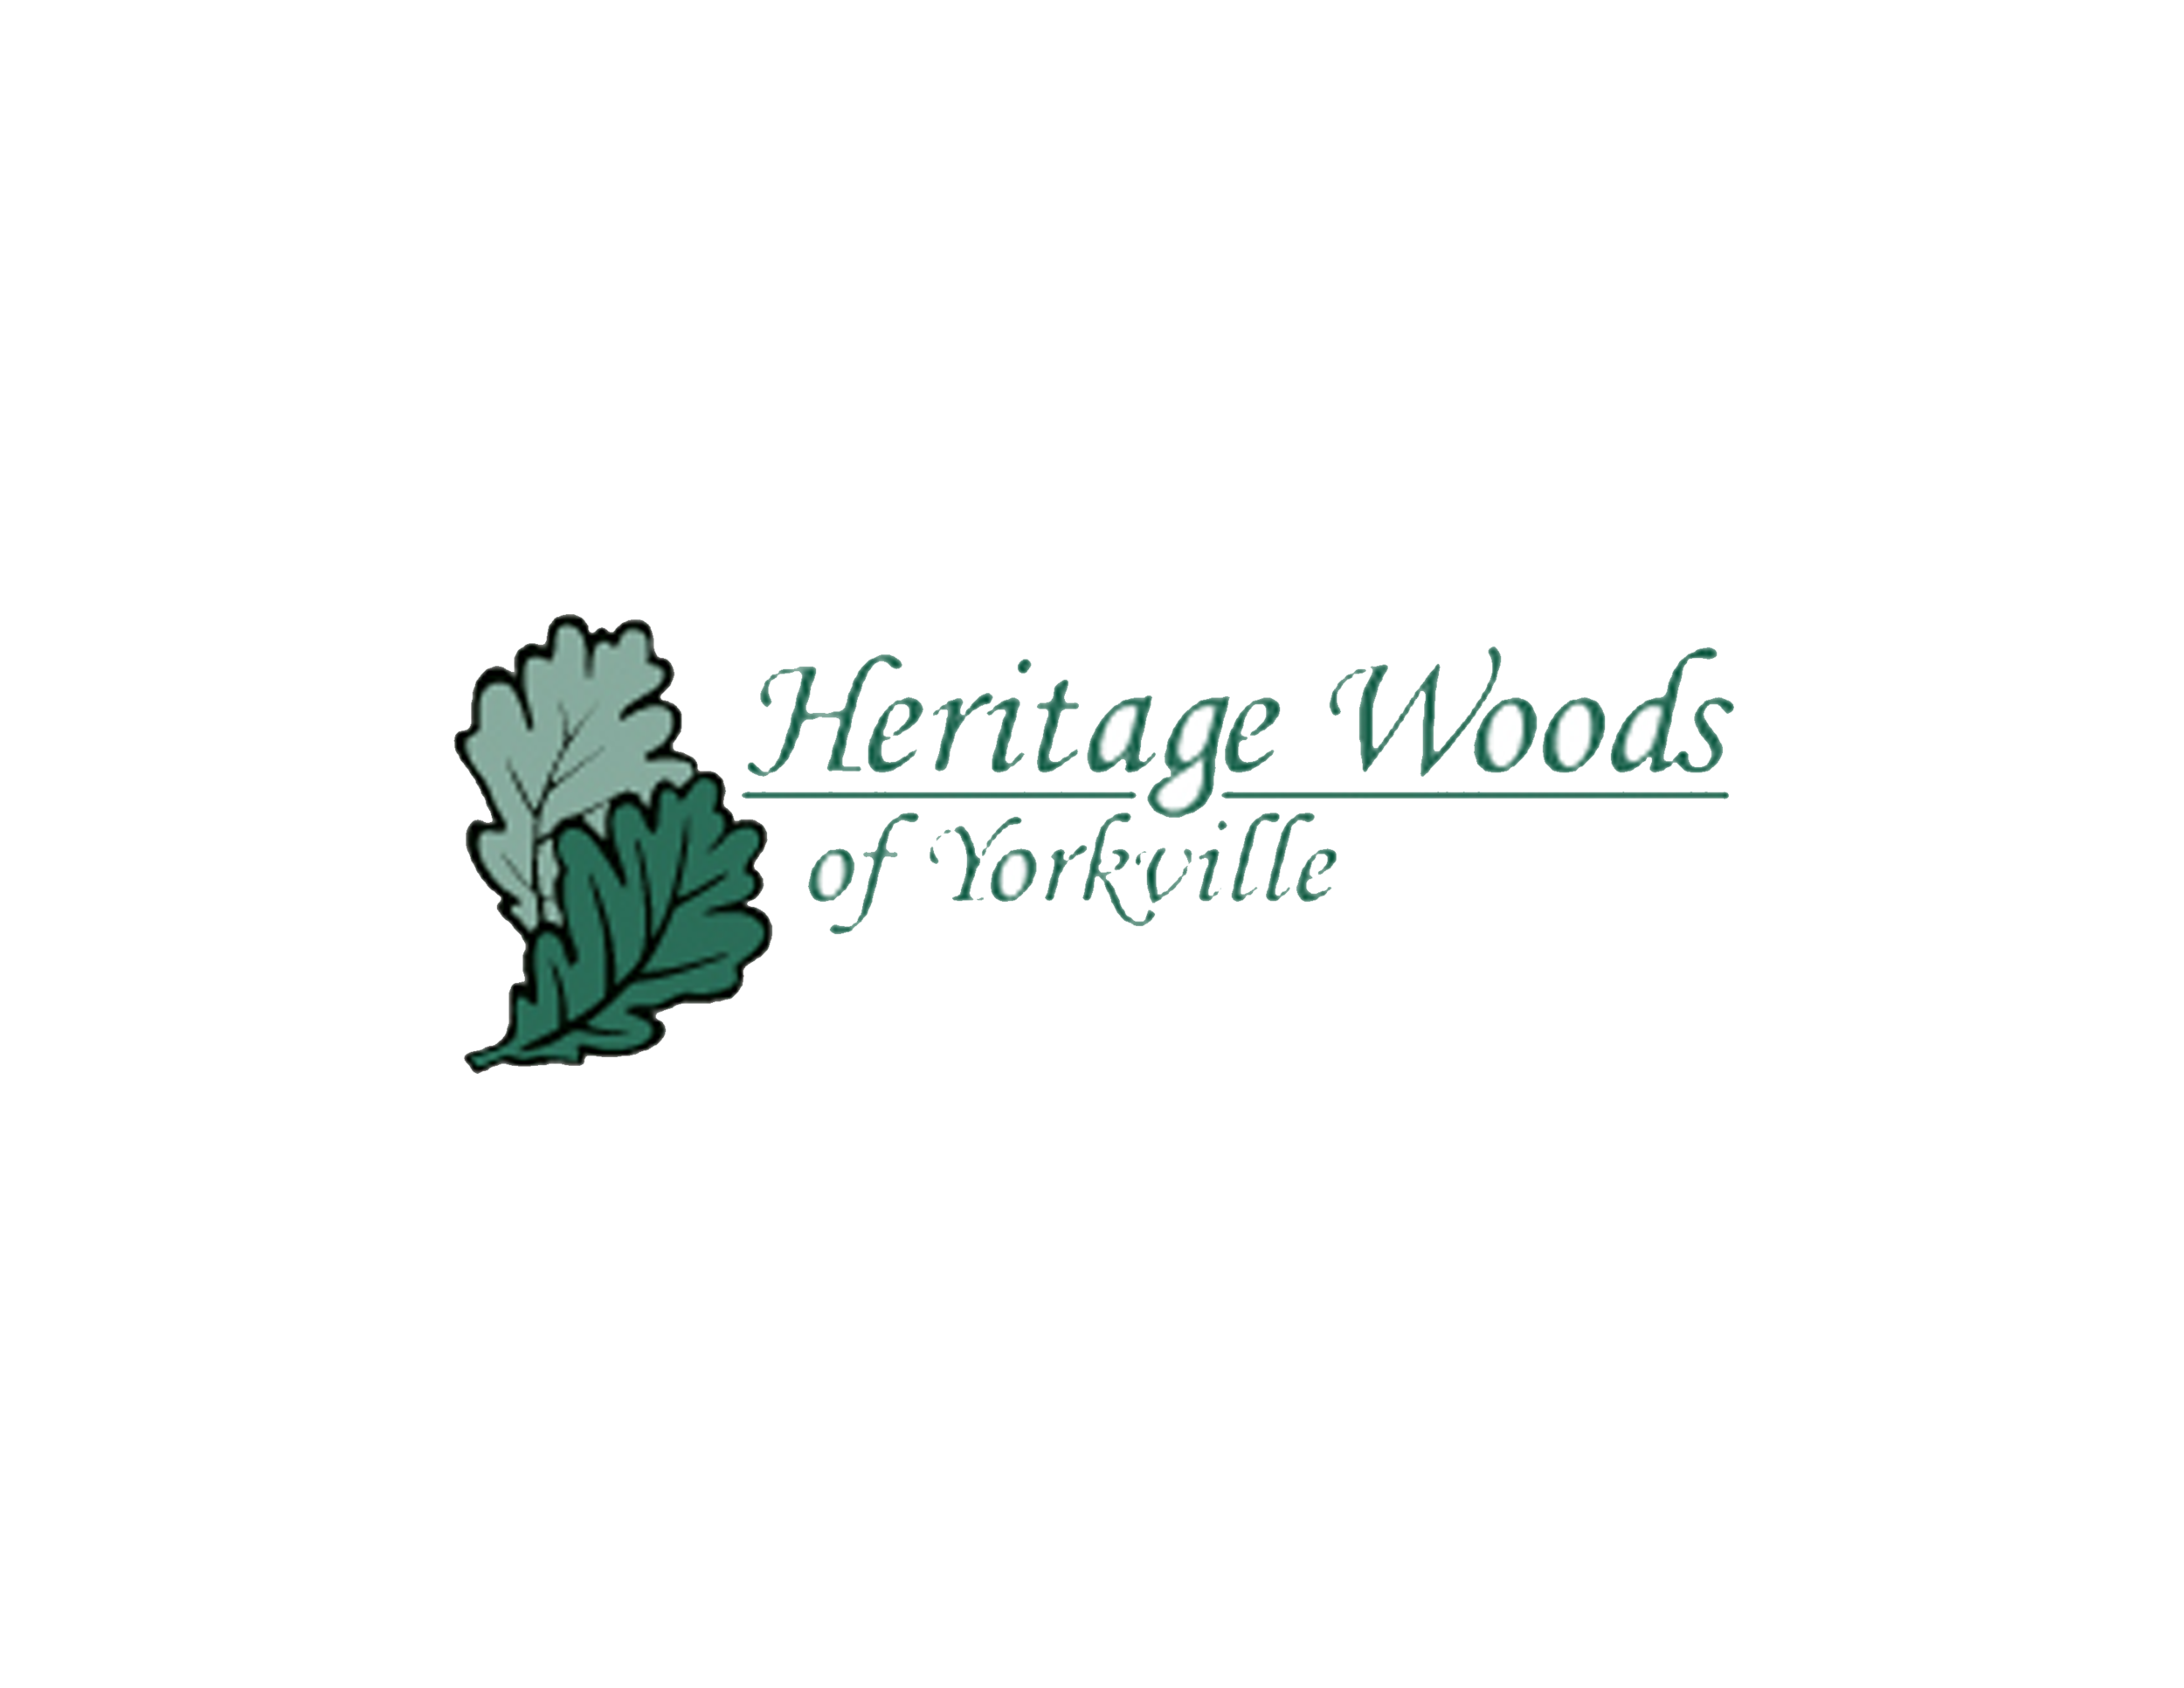 heritagewoods.png